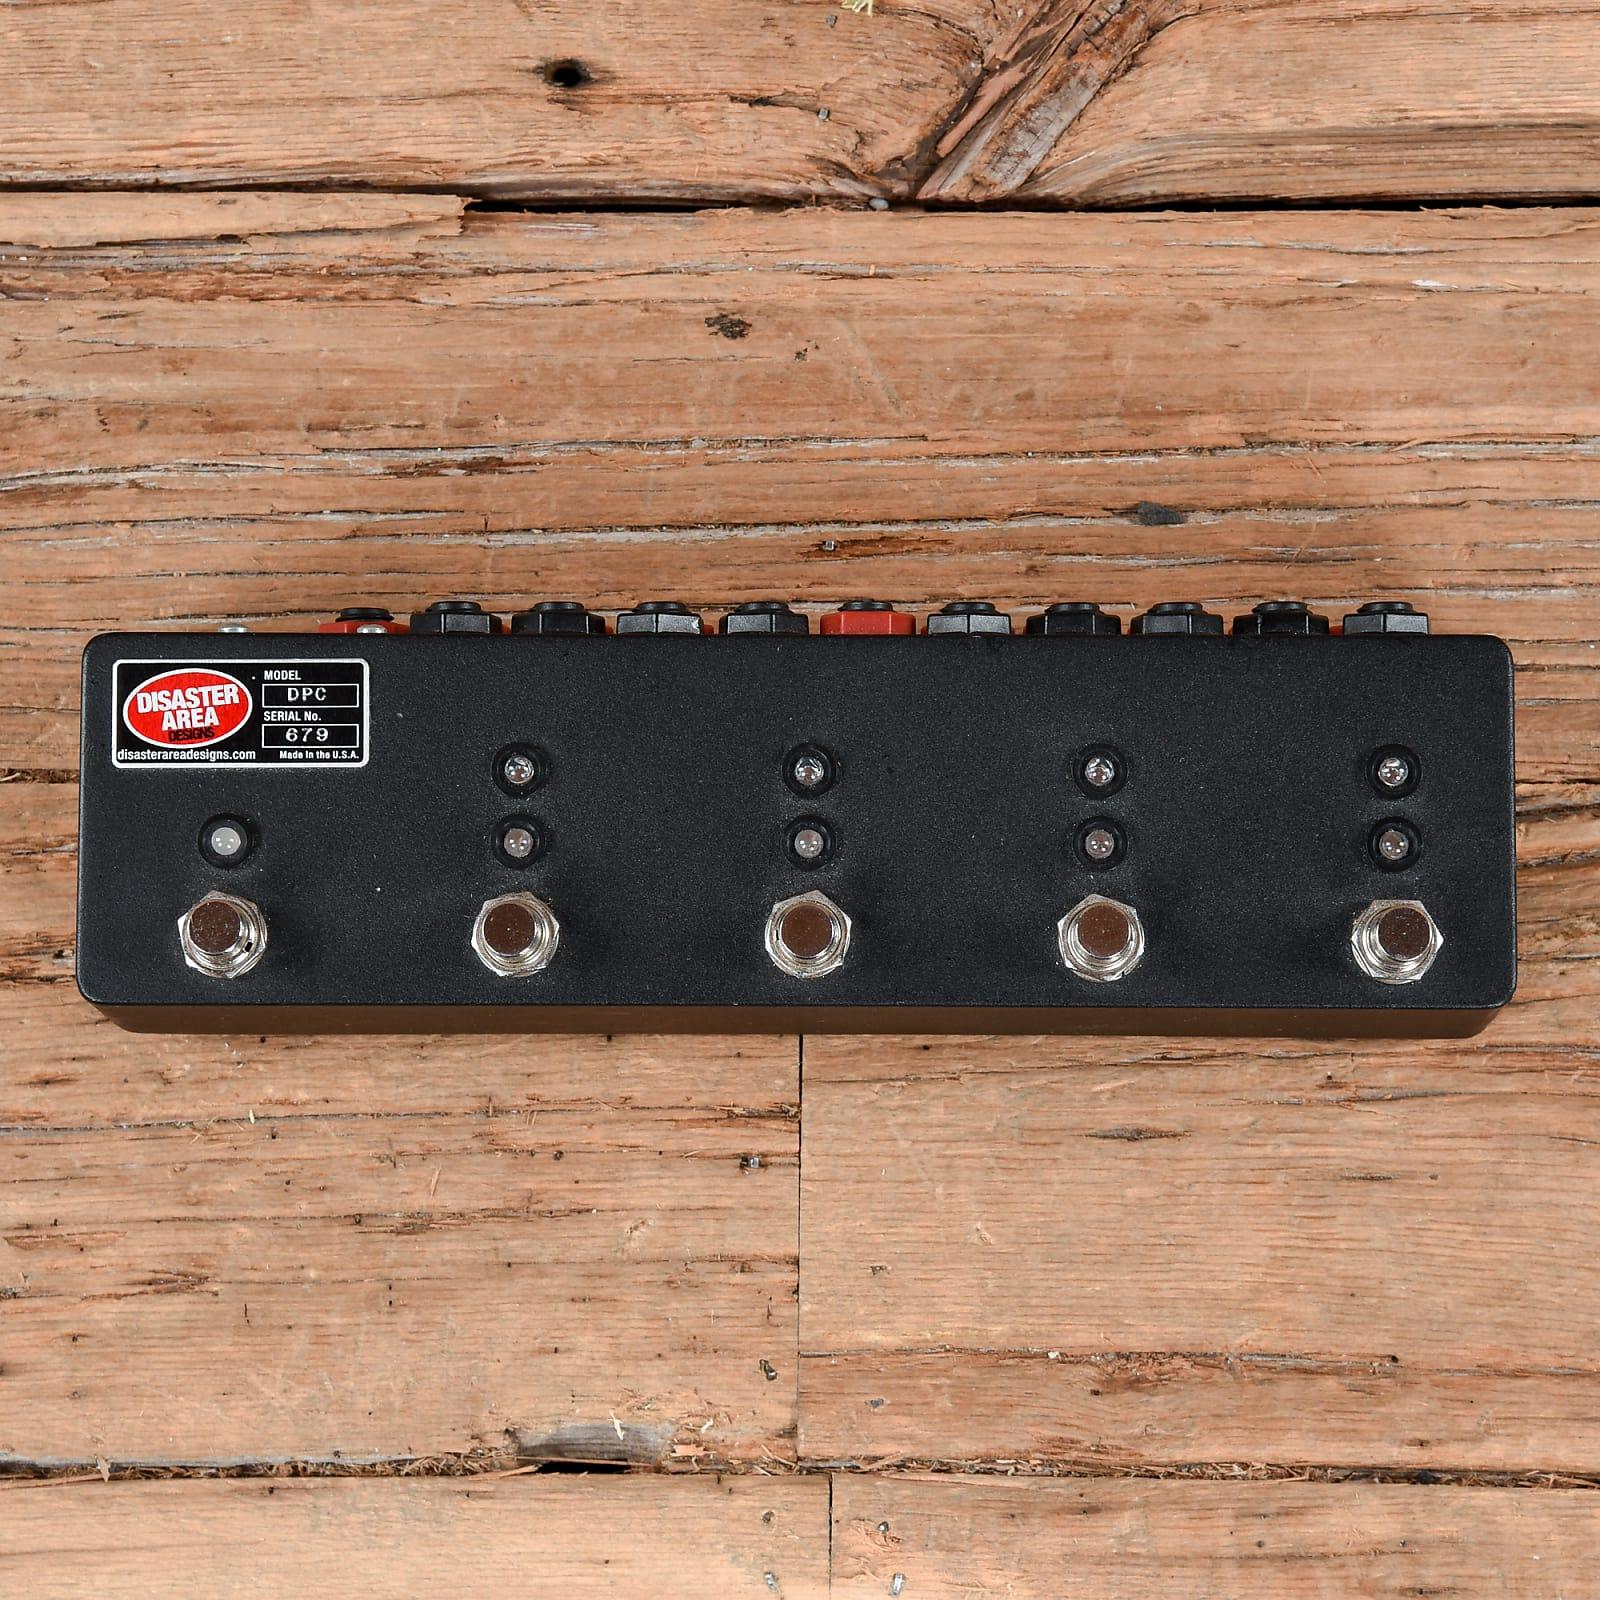 Disaster Area DPC-5 MIDI Pedalboard Controller & Loop Switcher USED